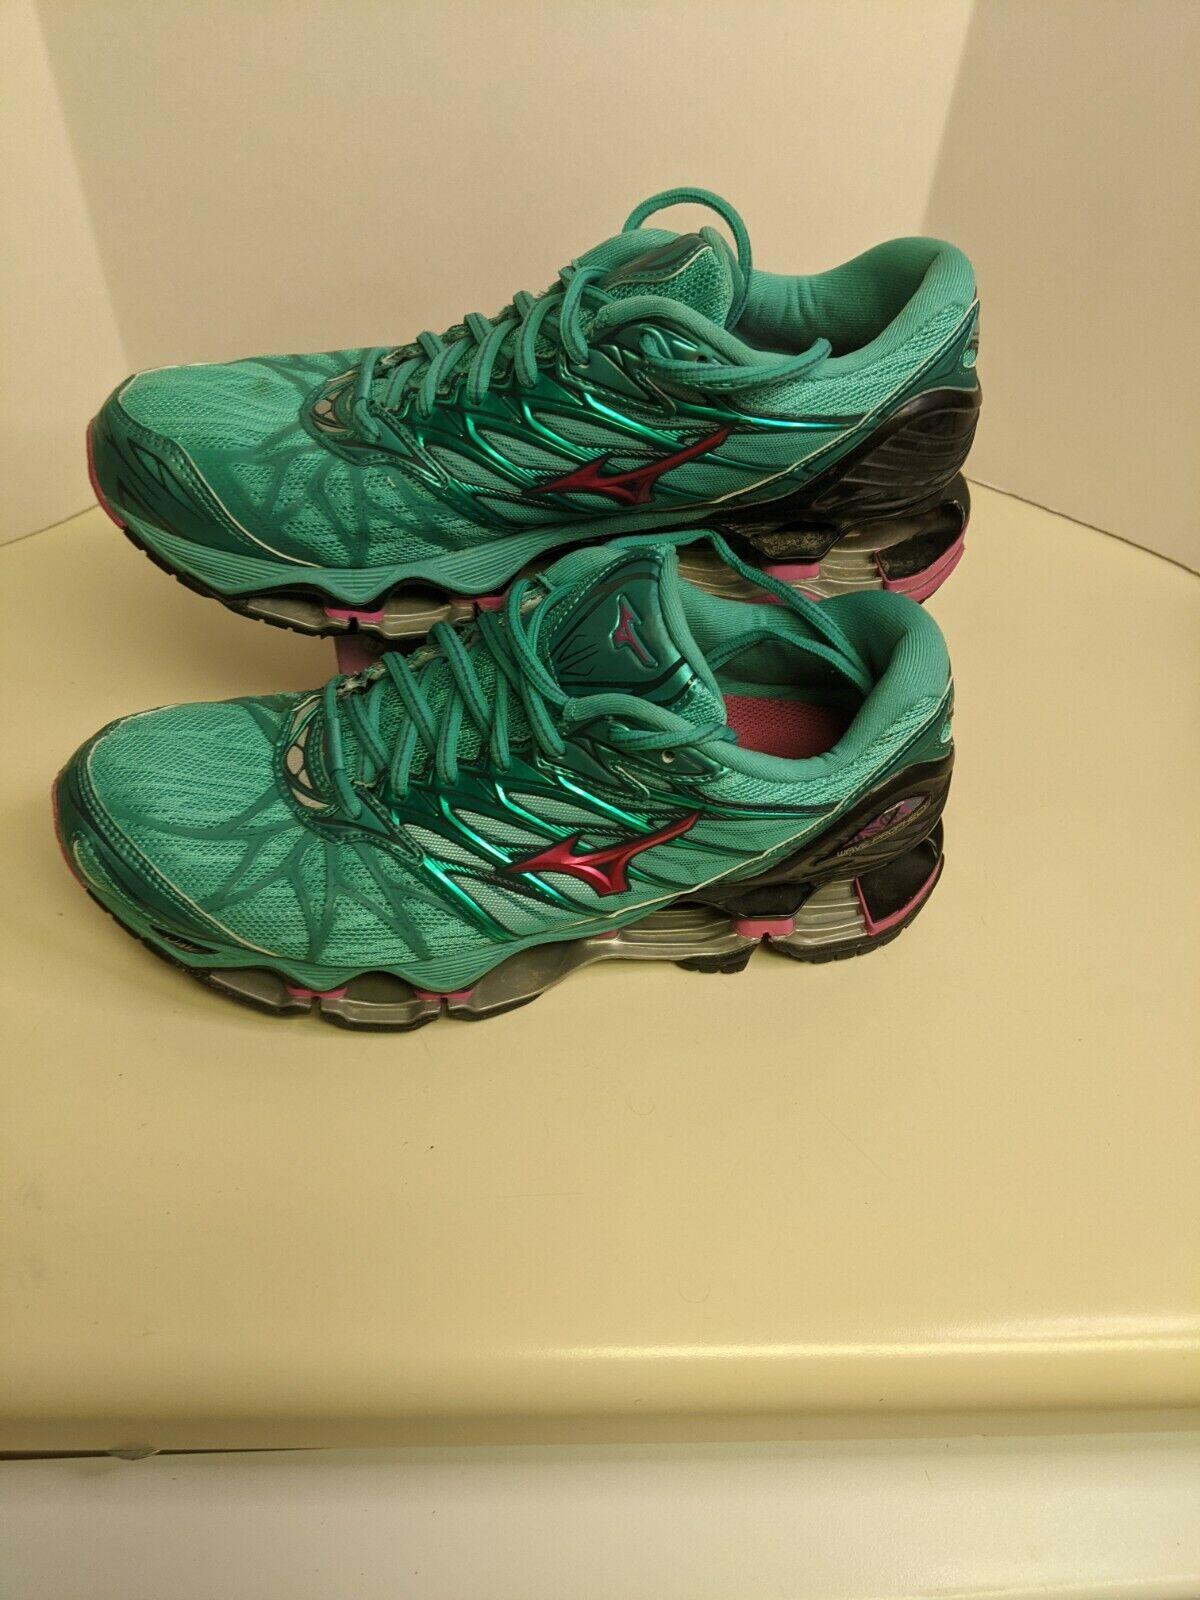 Mizuno Wave Prophecy 7 Running Shoe Men's Size 9.5 Seafoam ... GREAT CONDITION.